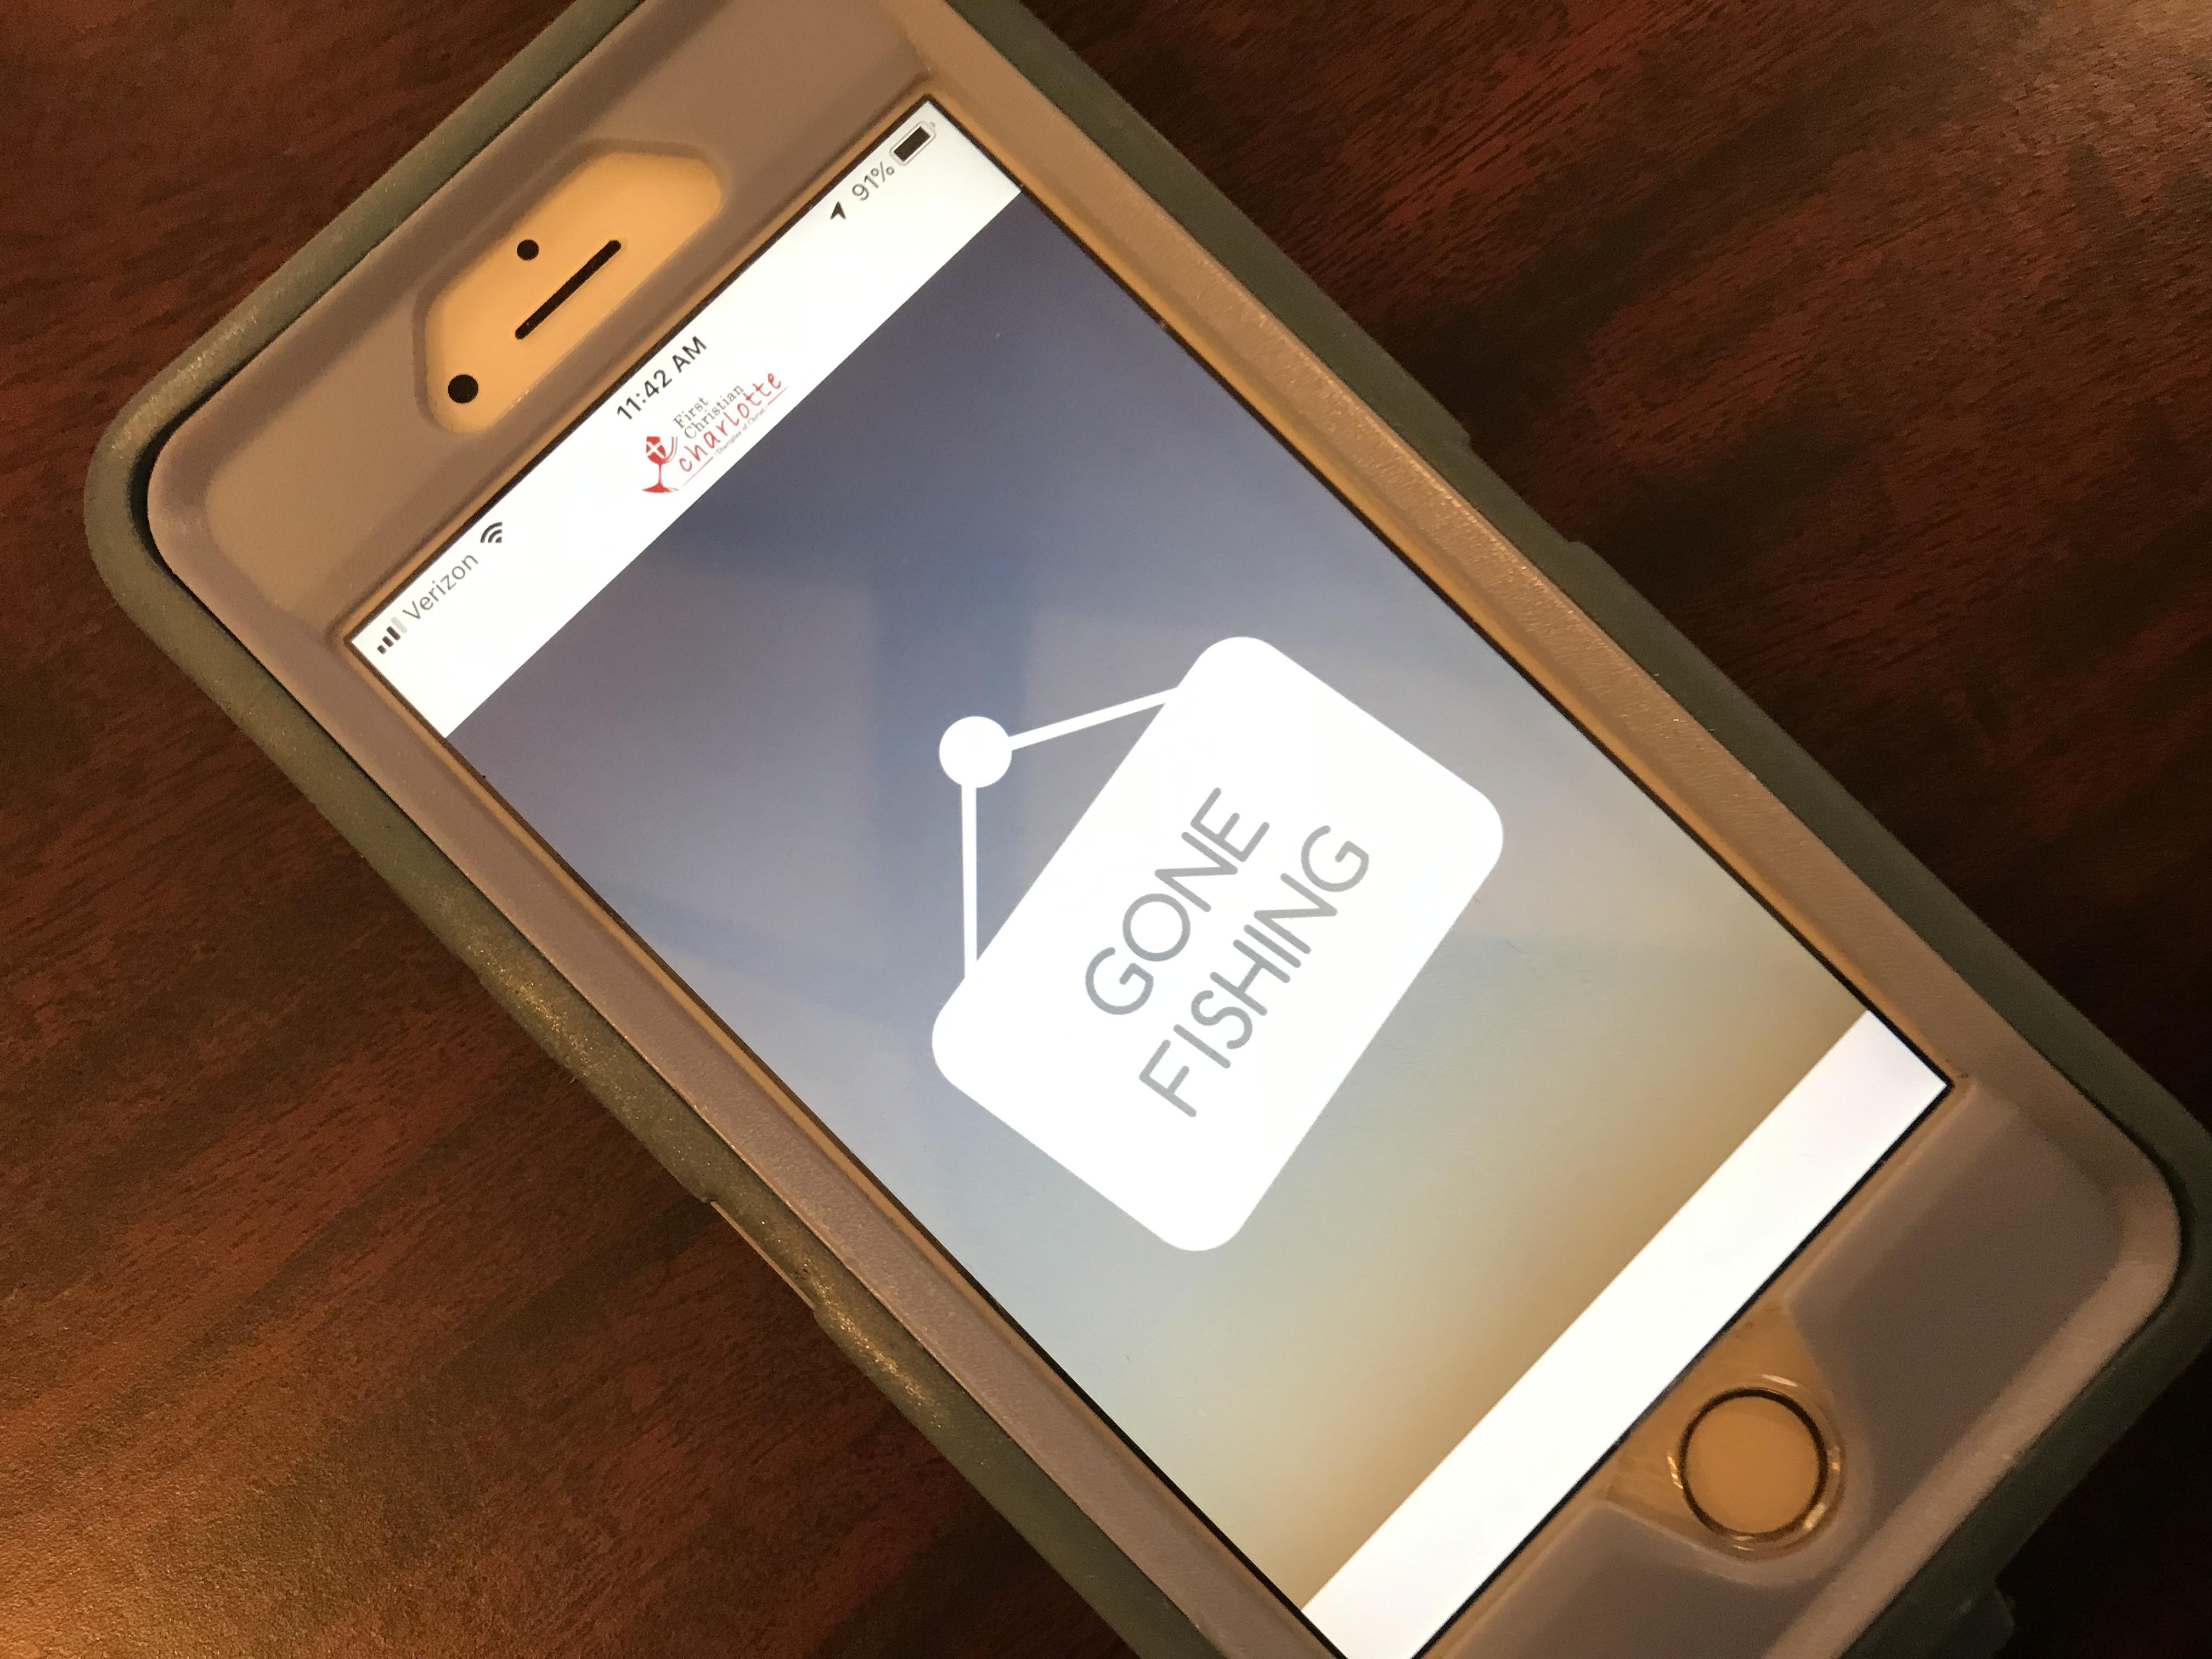 FCC - Where'd the App Go? A Post with Many Links